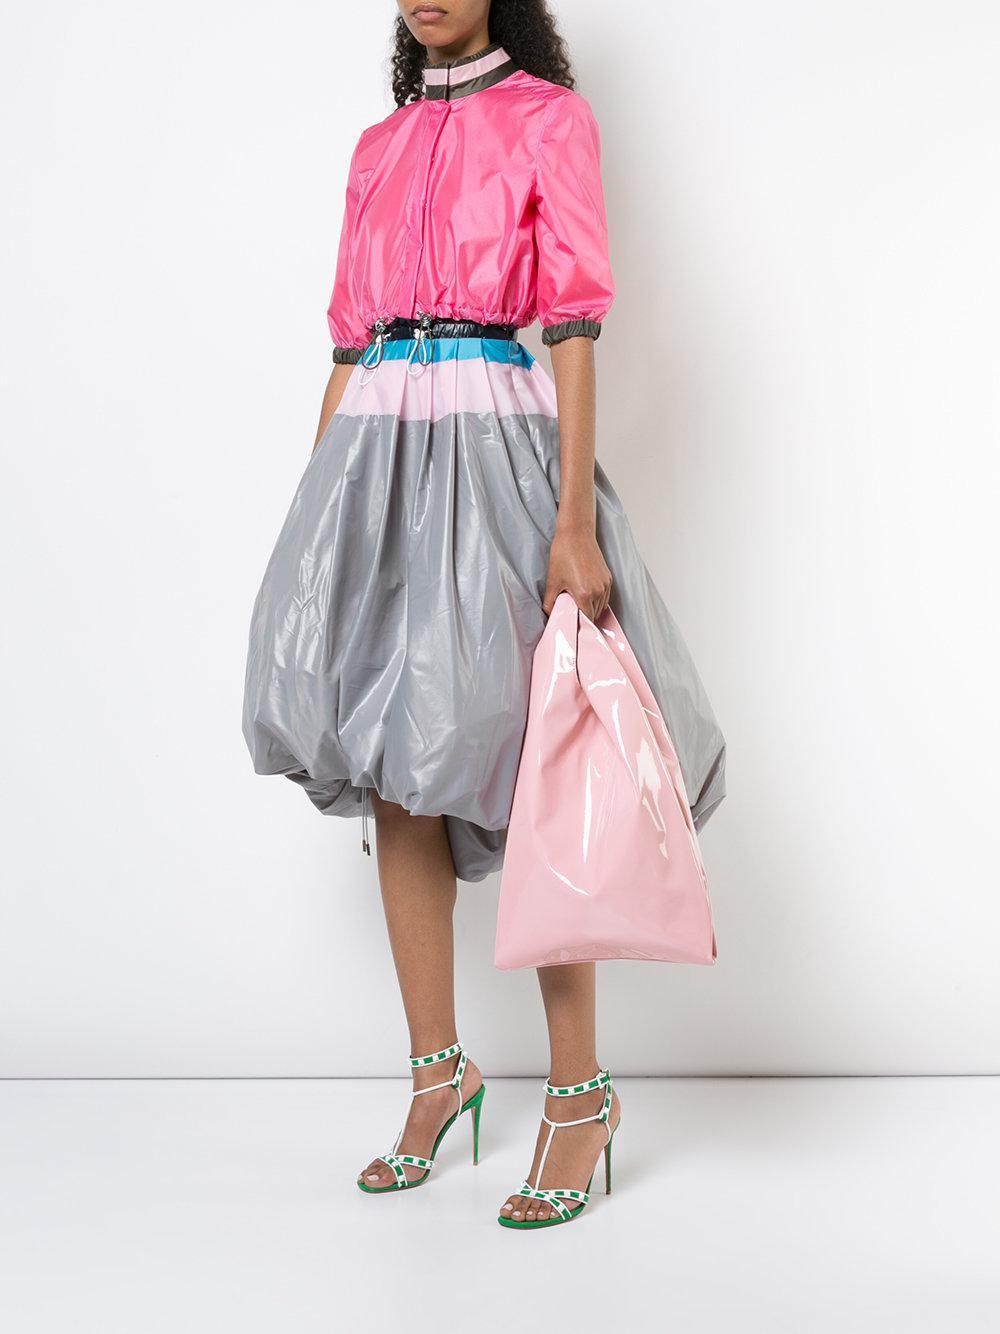 Hayward Suede Shopper Tote in Pink & Purple (Pink)